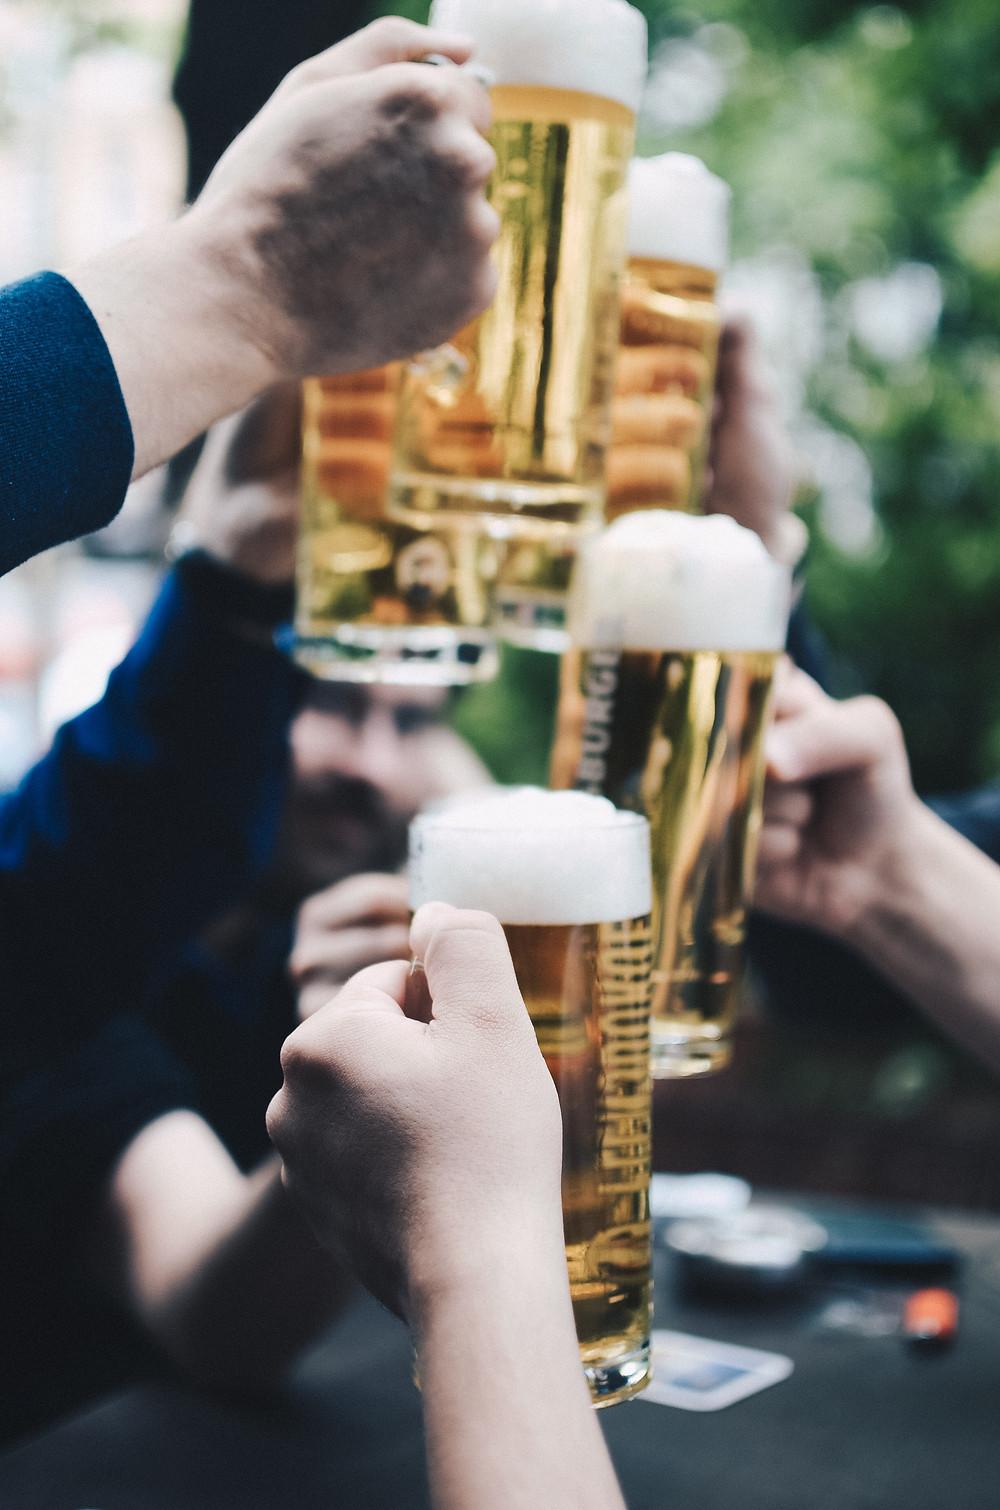 beer rewards app celebrate fun snapshot